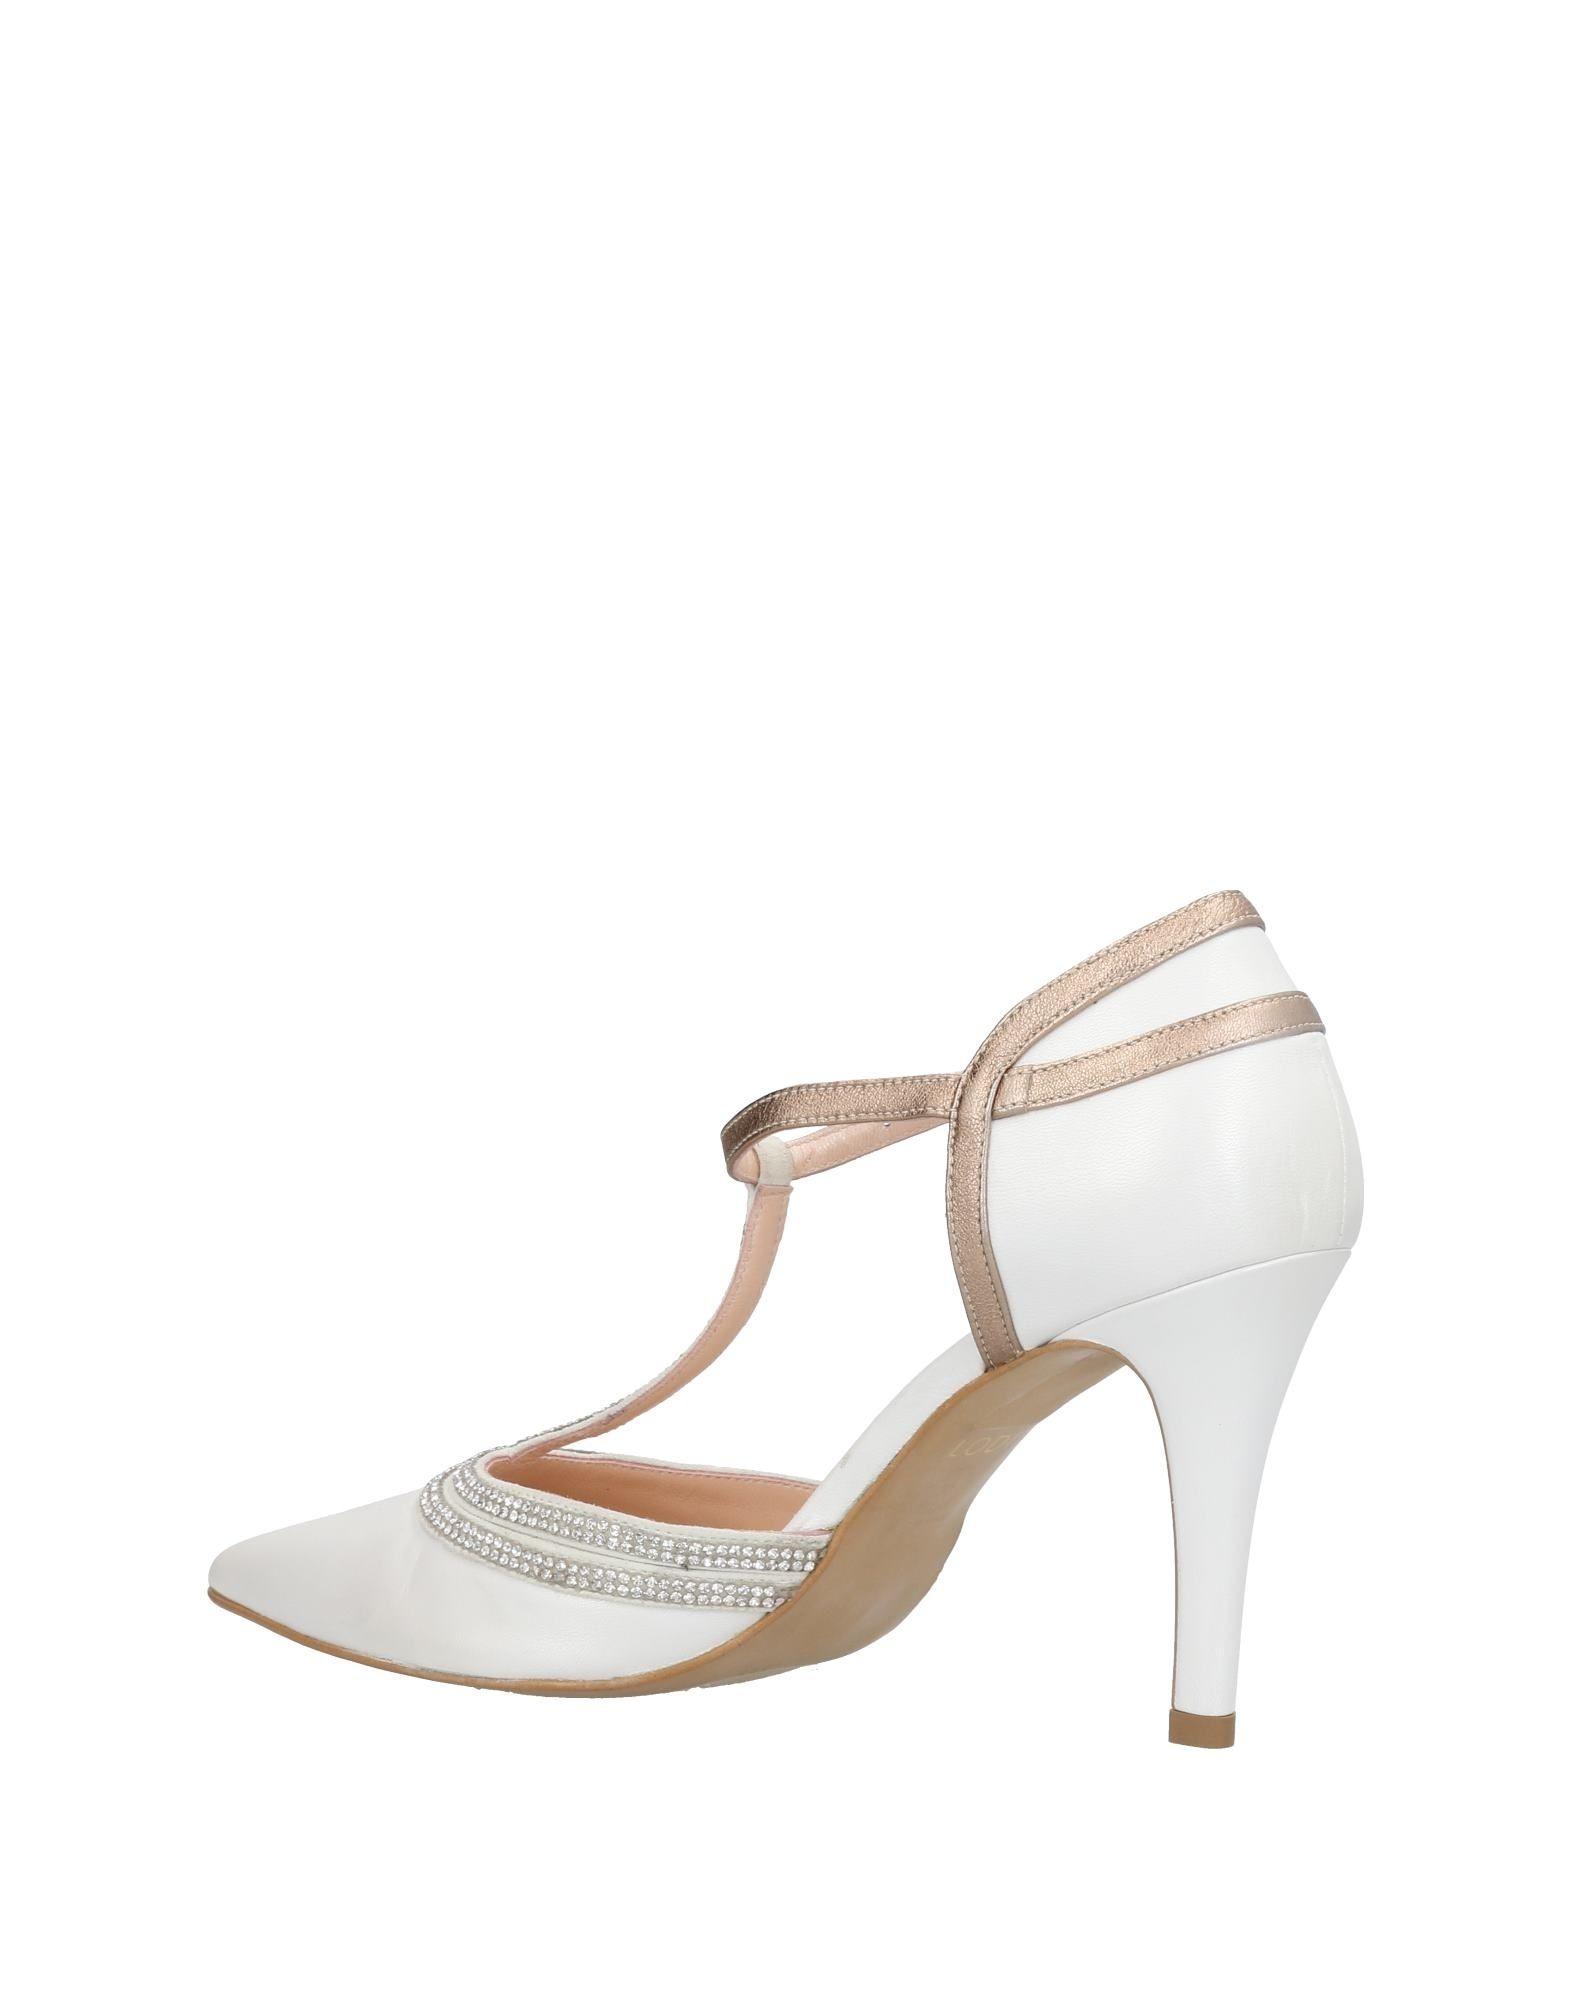 Lodi Pumps Damen  beliebte 11457821SV Gute Qualität beliebte  Schuhe c673bb